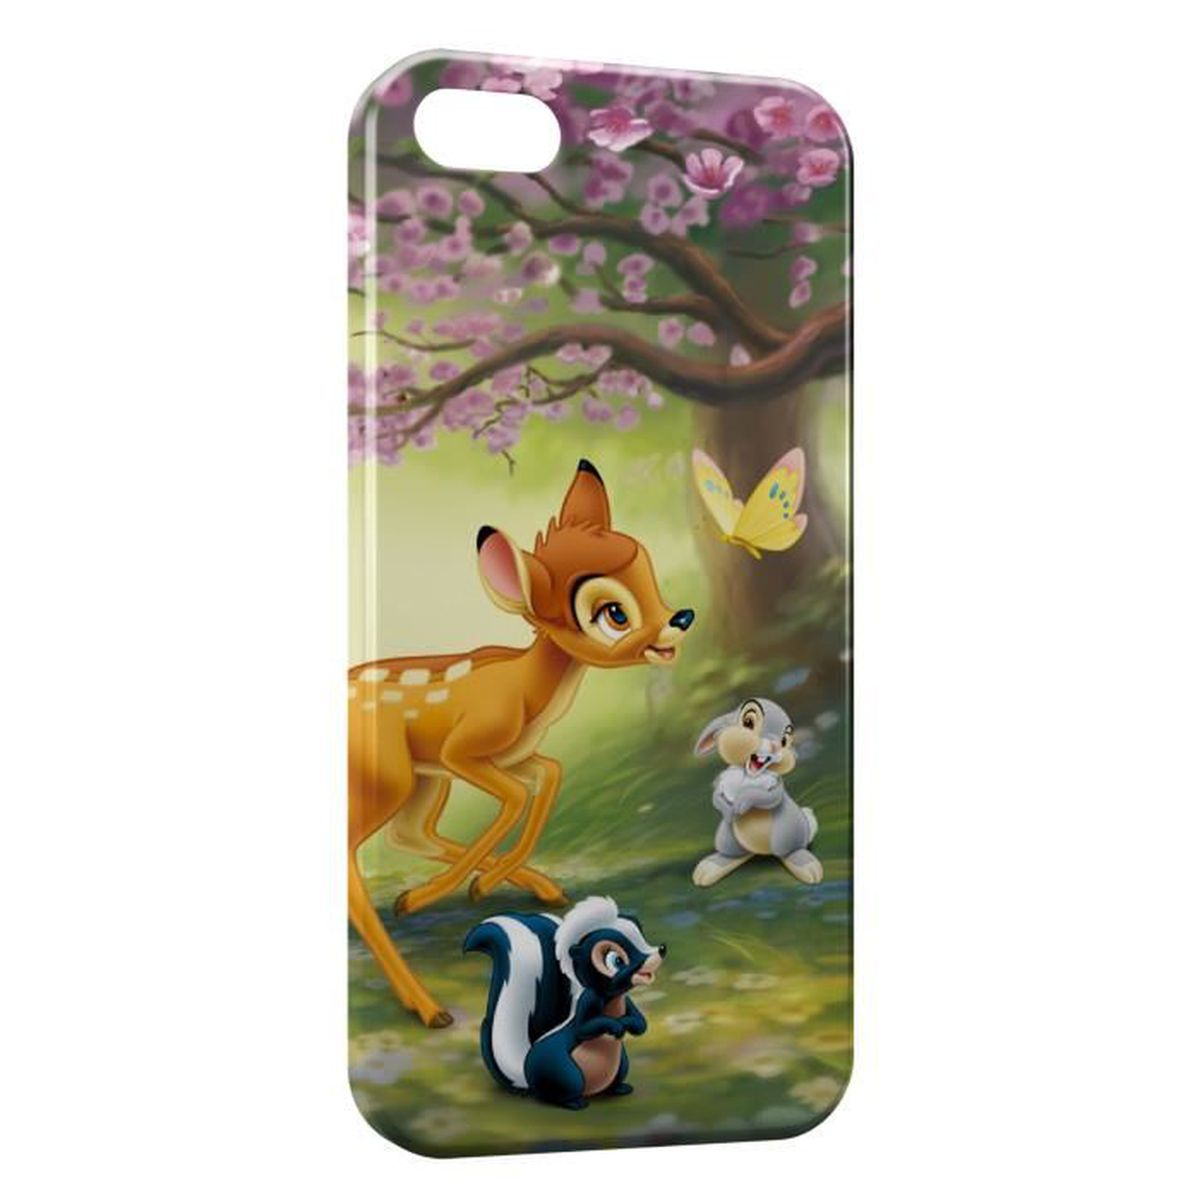 coque iphone 5 bambi